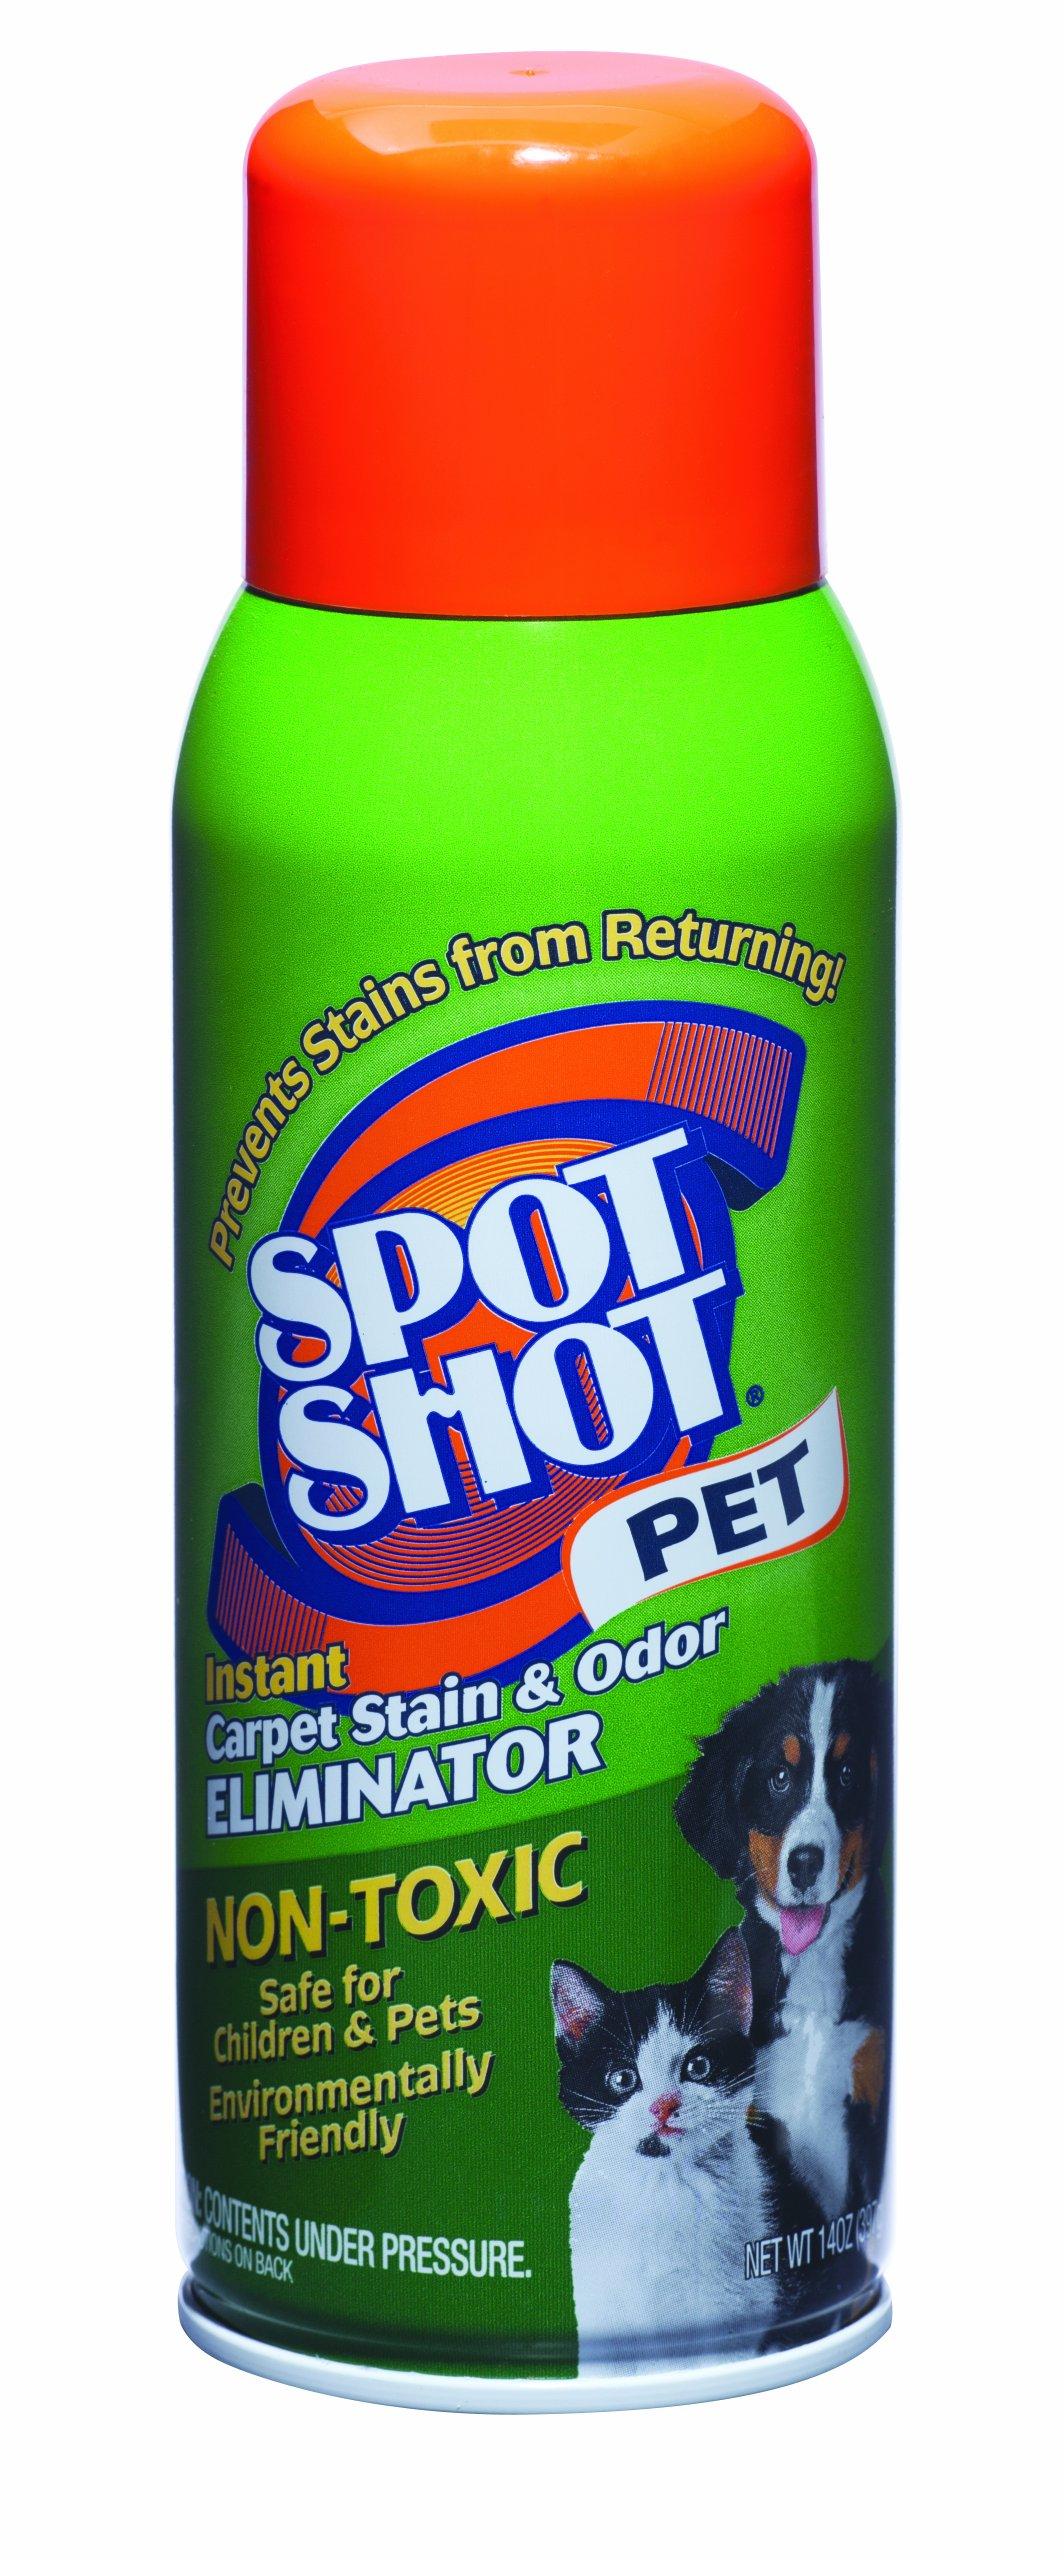 Spot Shot 009208 Non-Toxic Pet Instant Carpet Stain Remover 14 oz Aerosol (Pack of 6) by Spot Shot